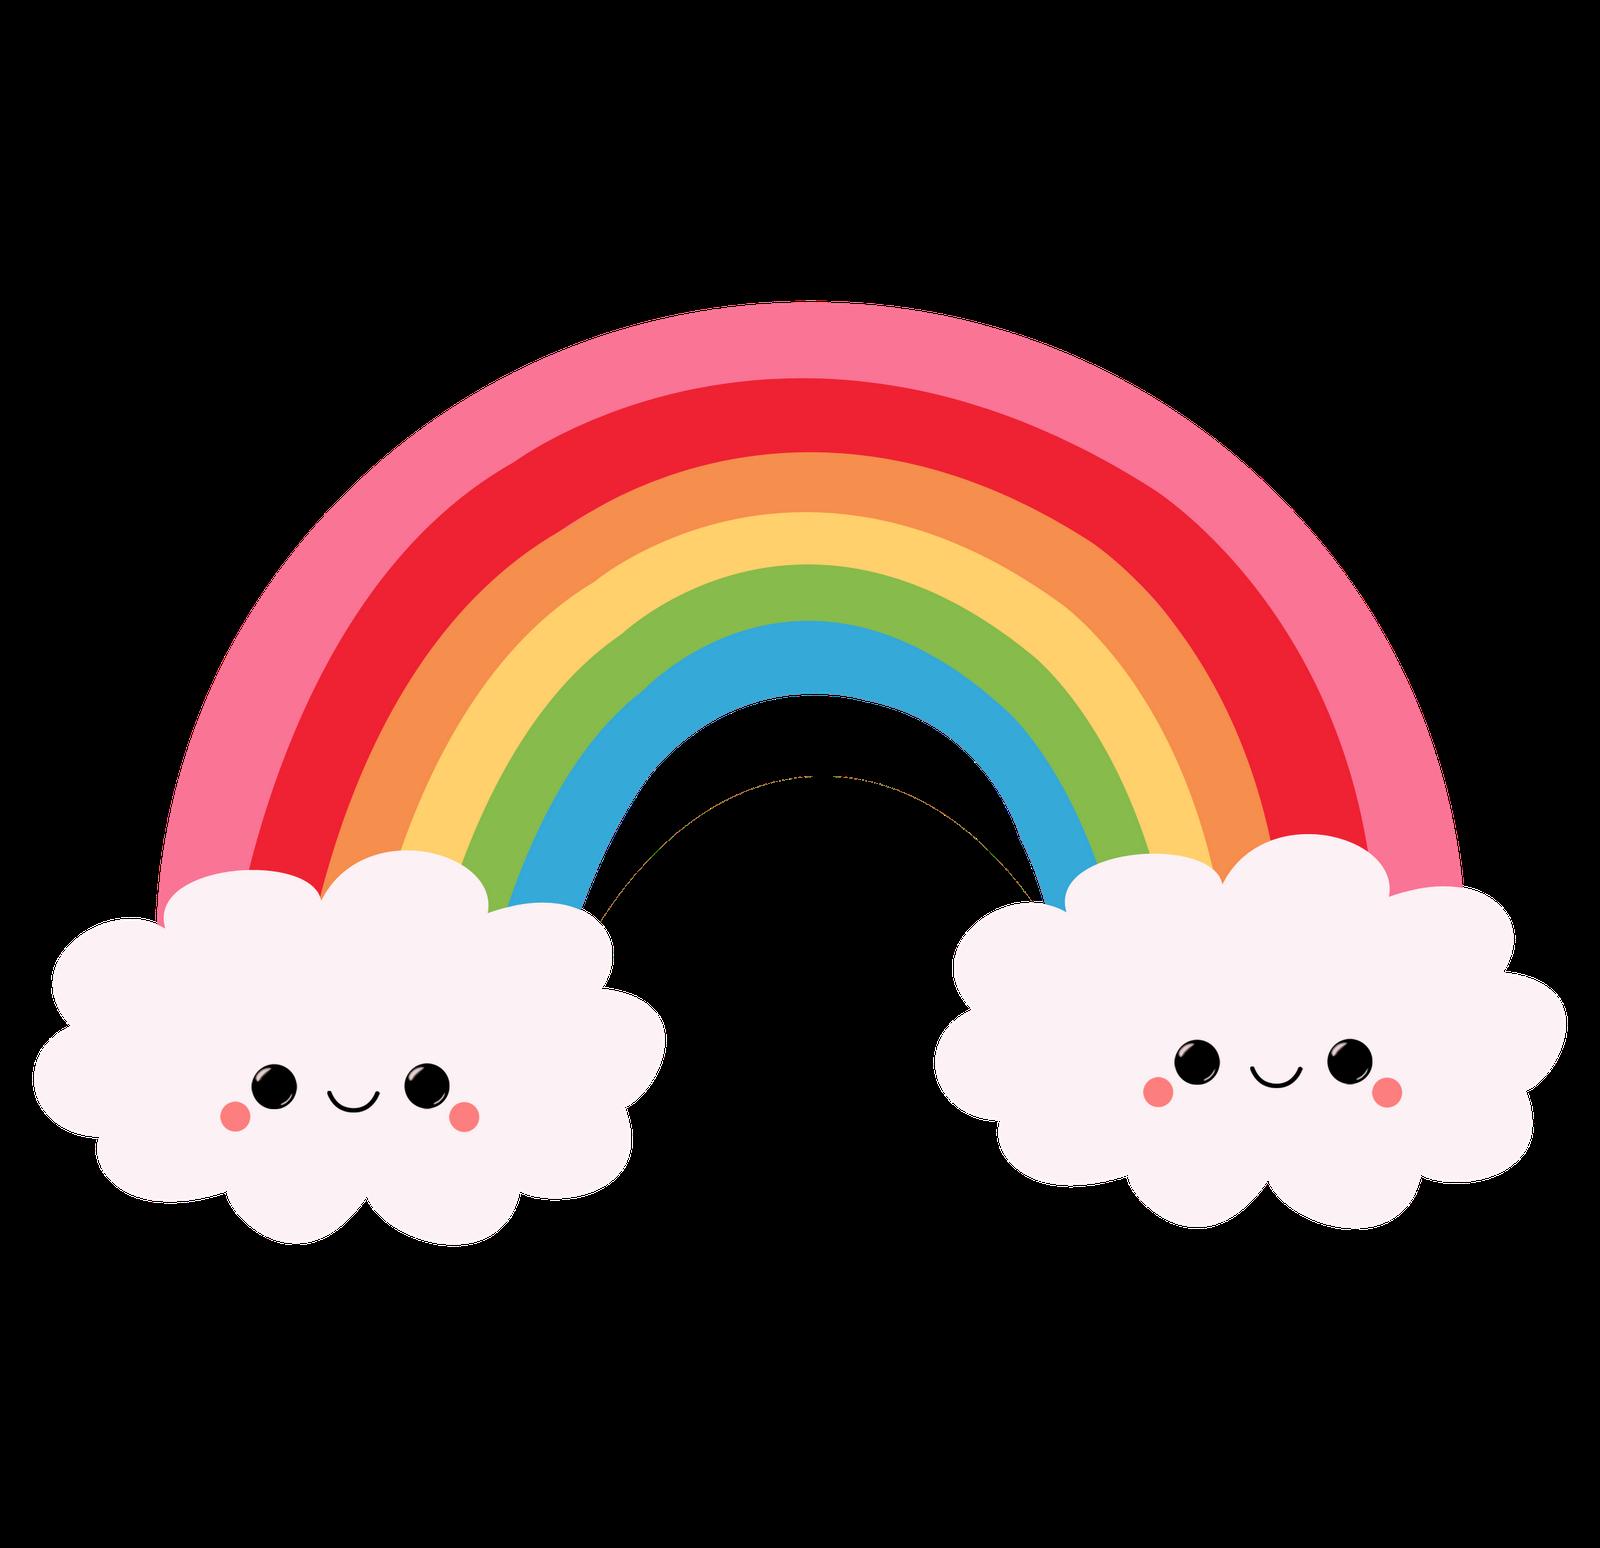 sunshine and rainbows submarine clip art black and white submarine clipart for preschoolers